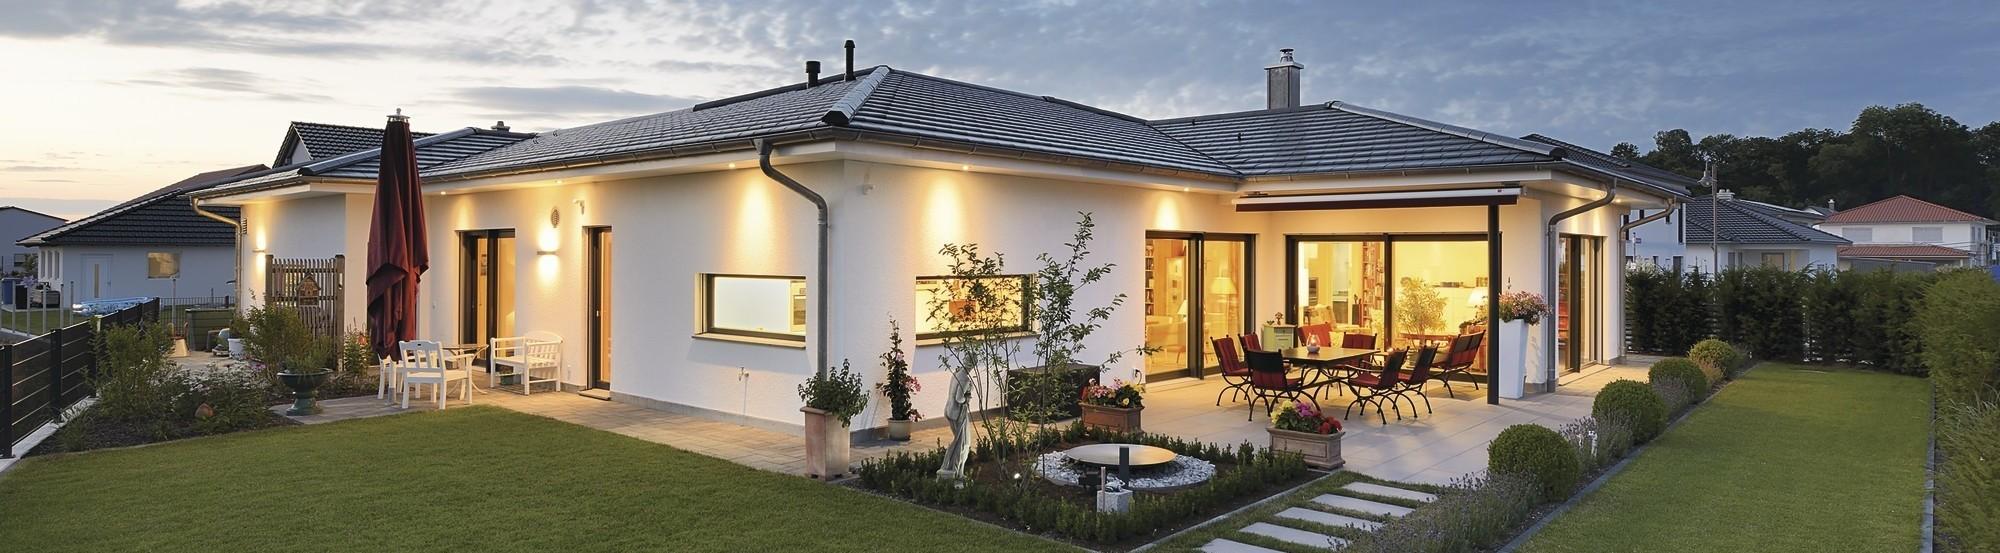 Bungalow Holzhaus Fertighau_s_Bungalow.jpg